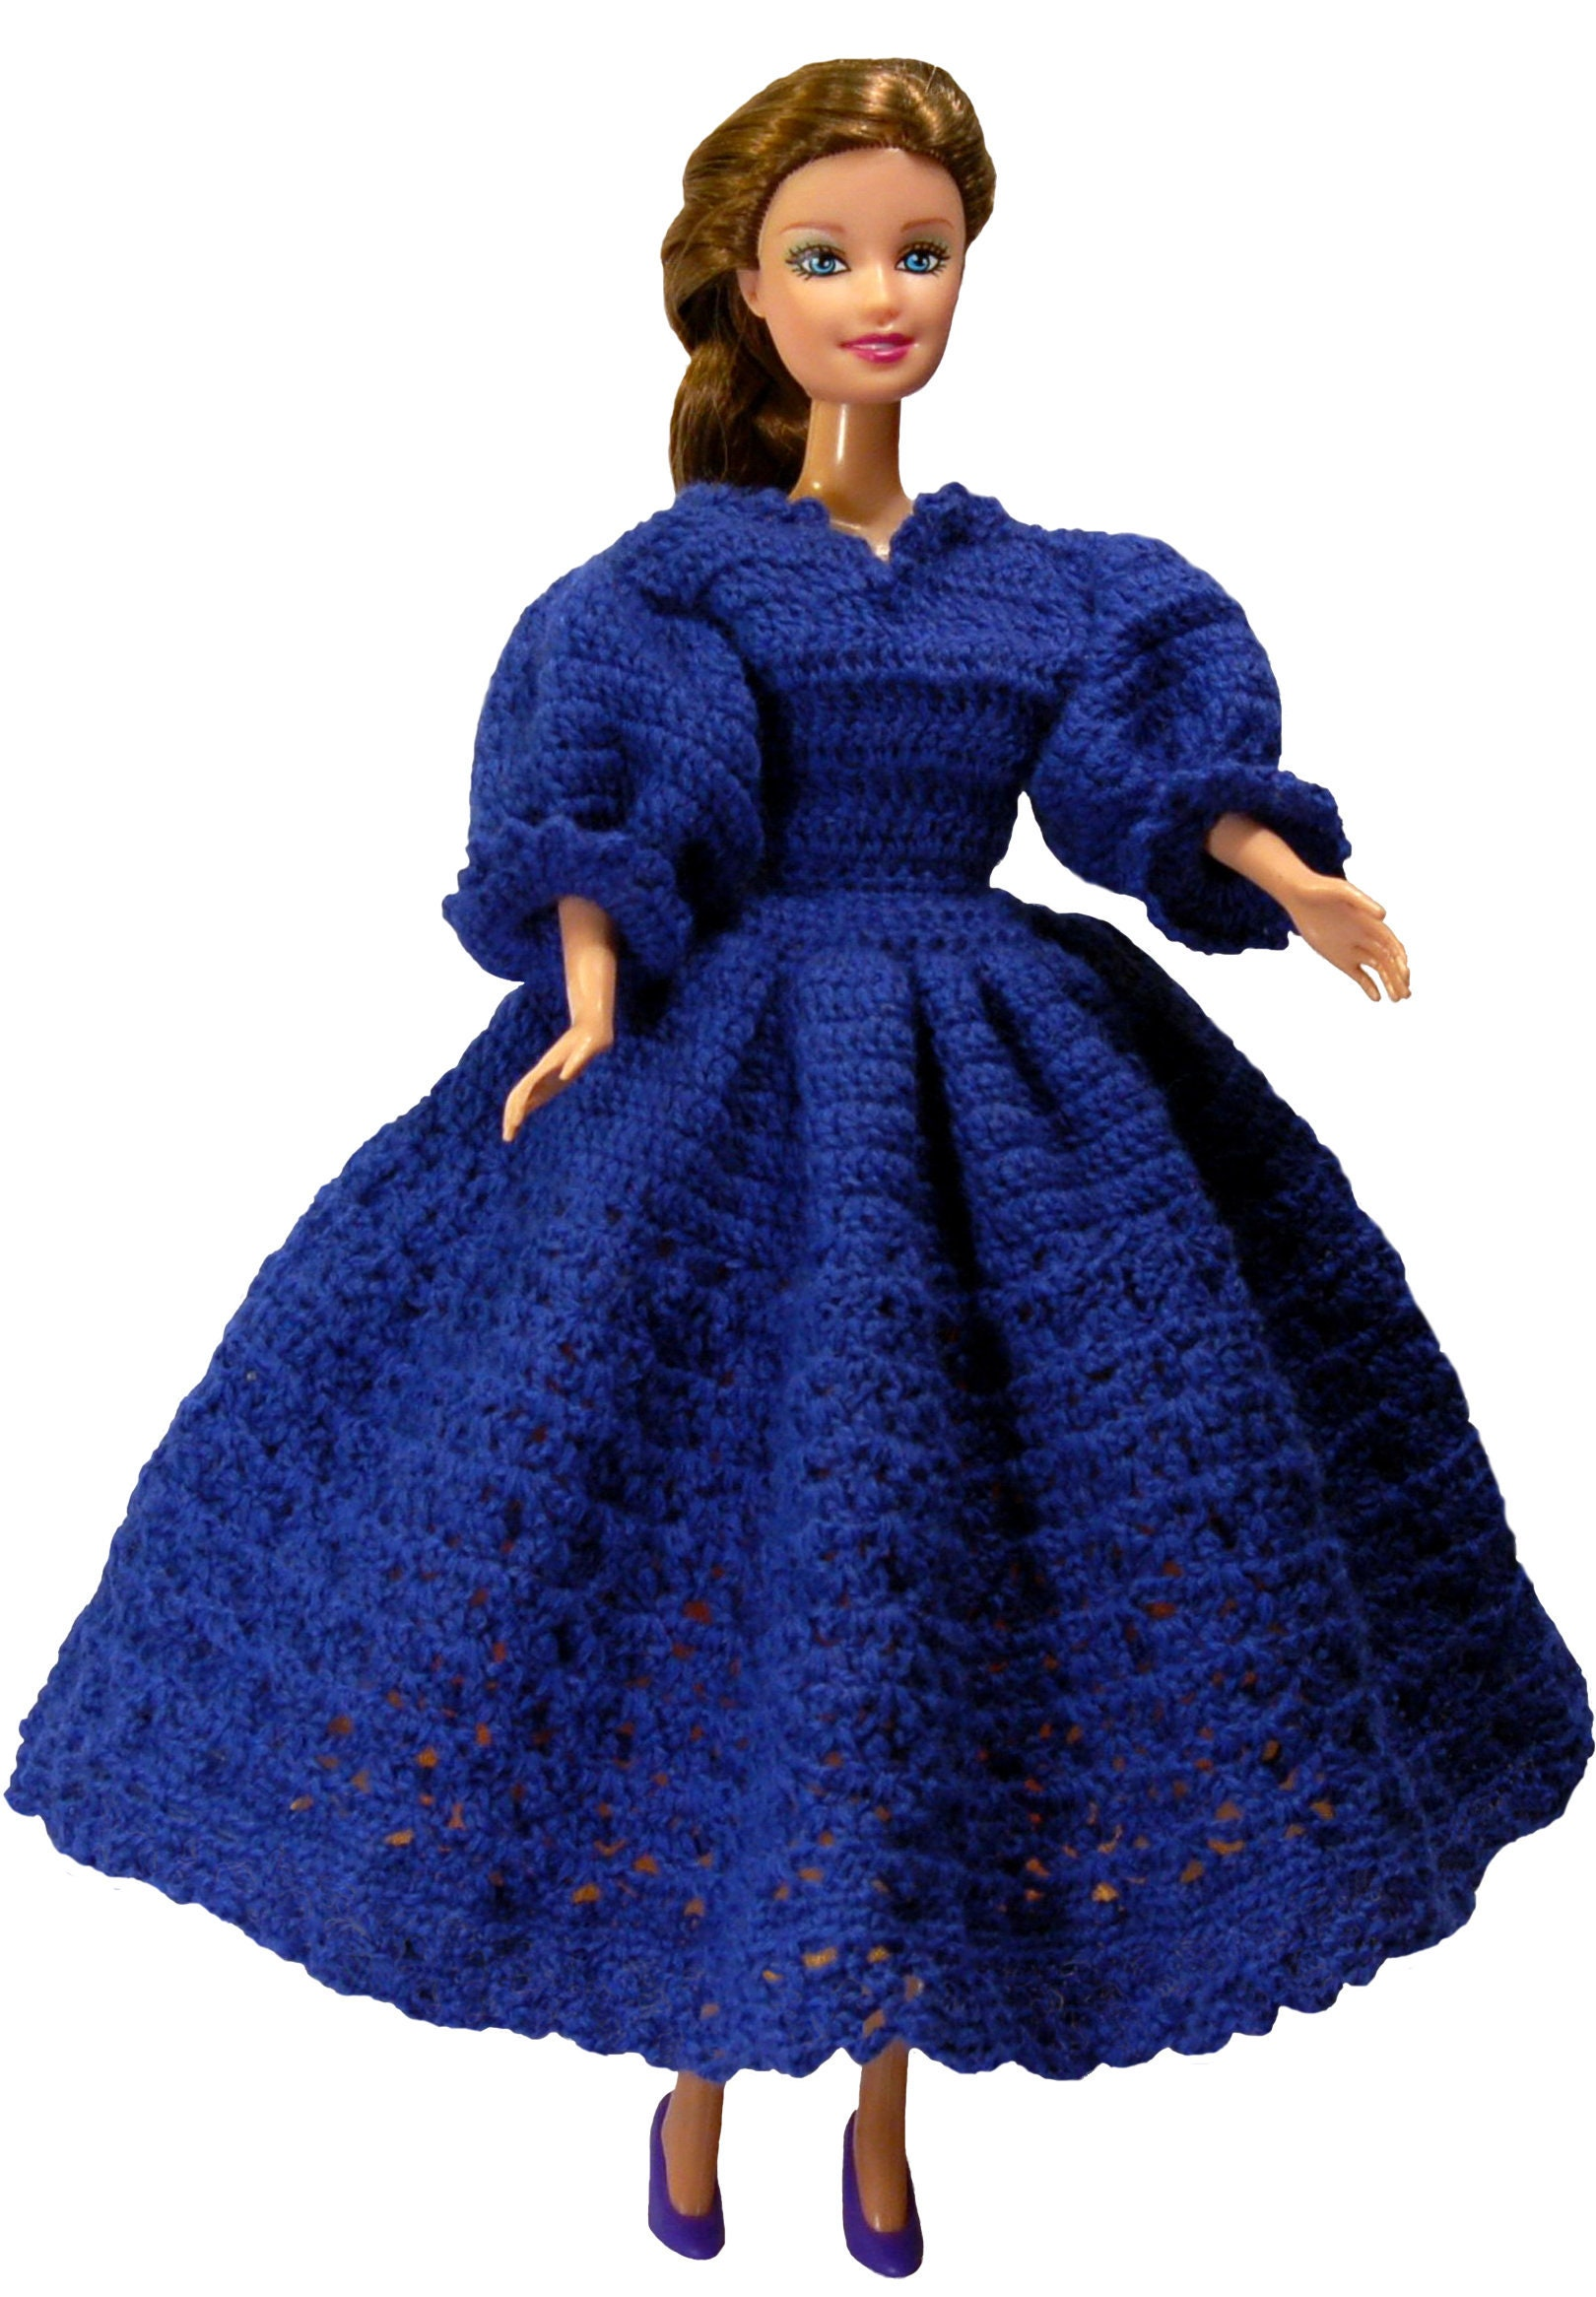 Crochet Doll Dress Pattern Barbie clothes crochet Patterns Barbie ...